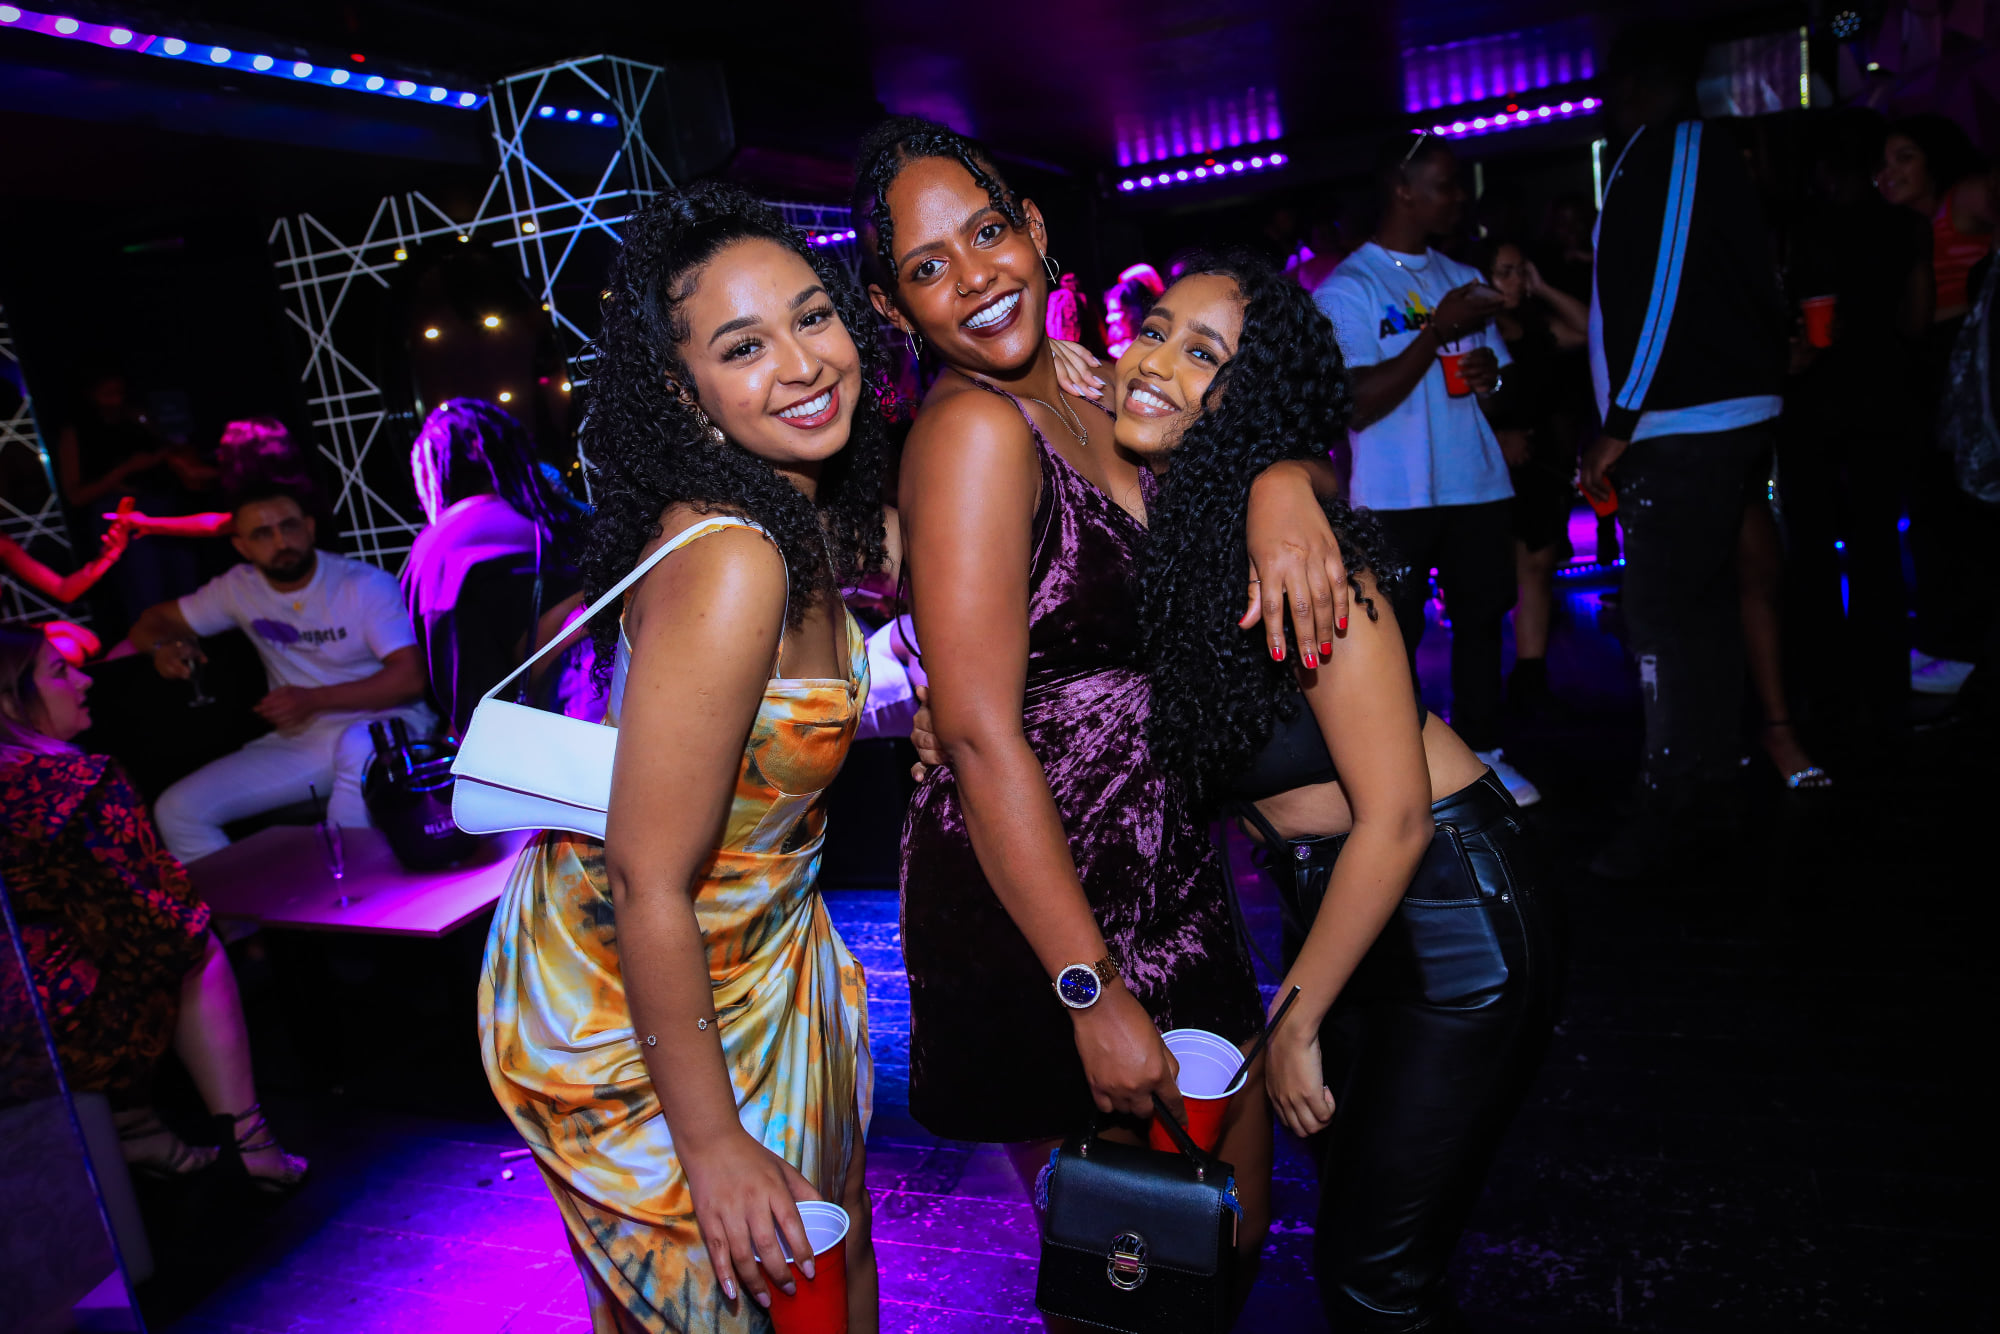 ISLAND MANIA - Bashment x Afrobeats x Soca Party